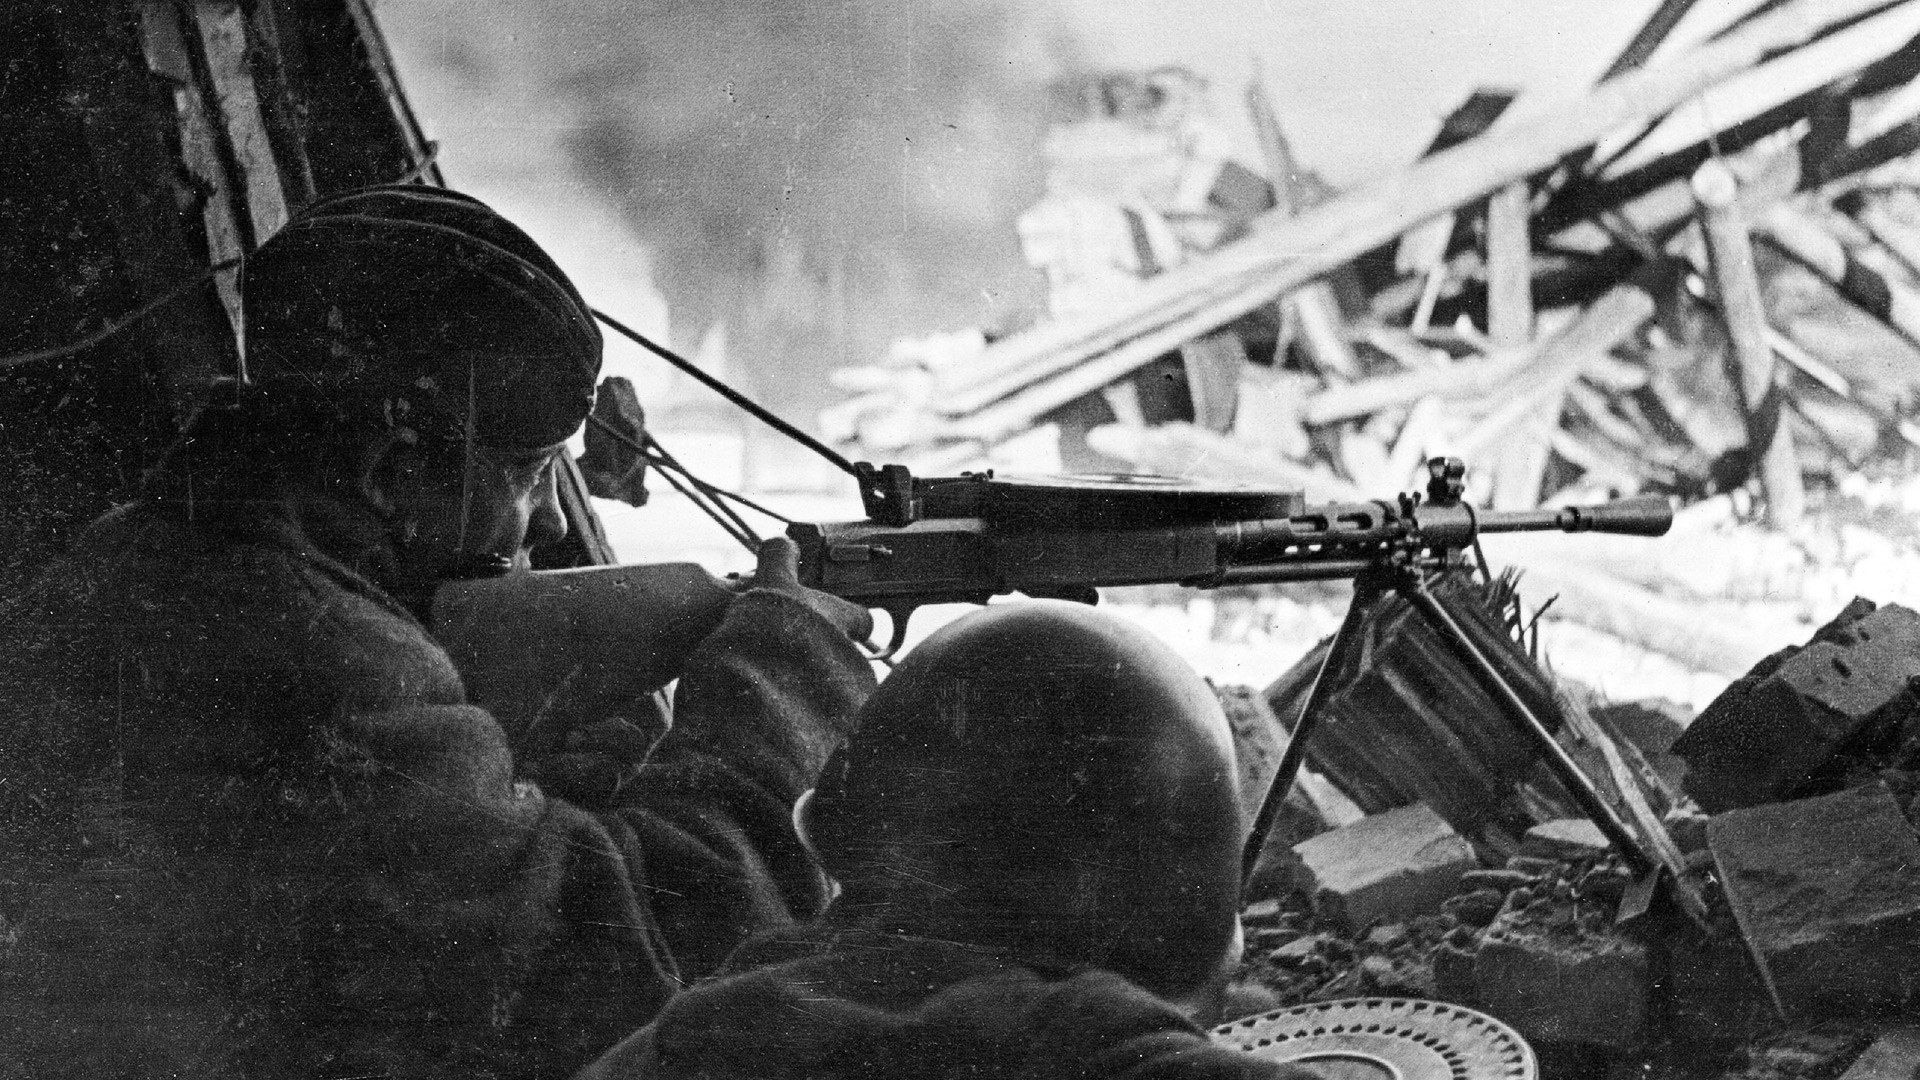 Sovjetski mitraljezec v predmestju Stalingrada